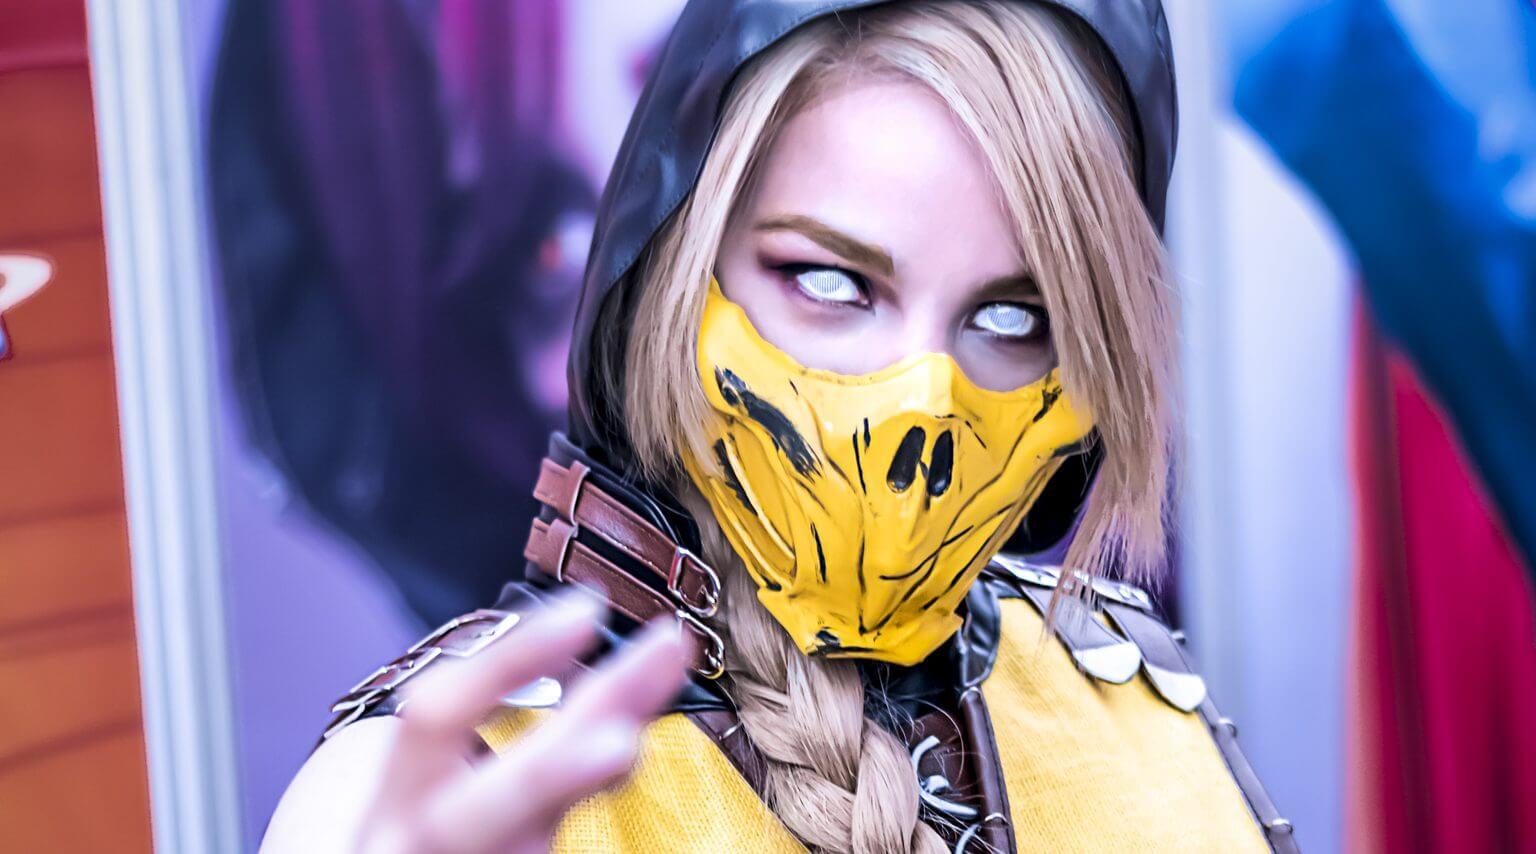 RocioCosplayer Mortal Kombat Scorpion Cosplay